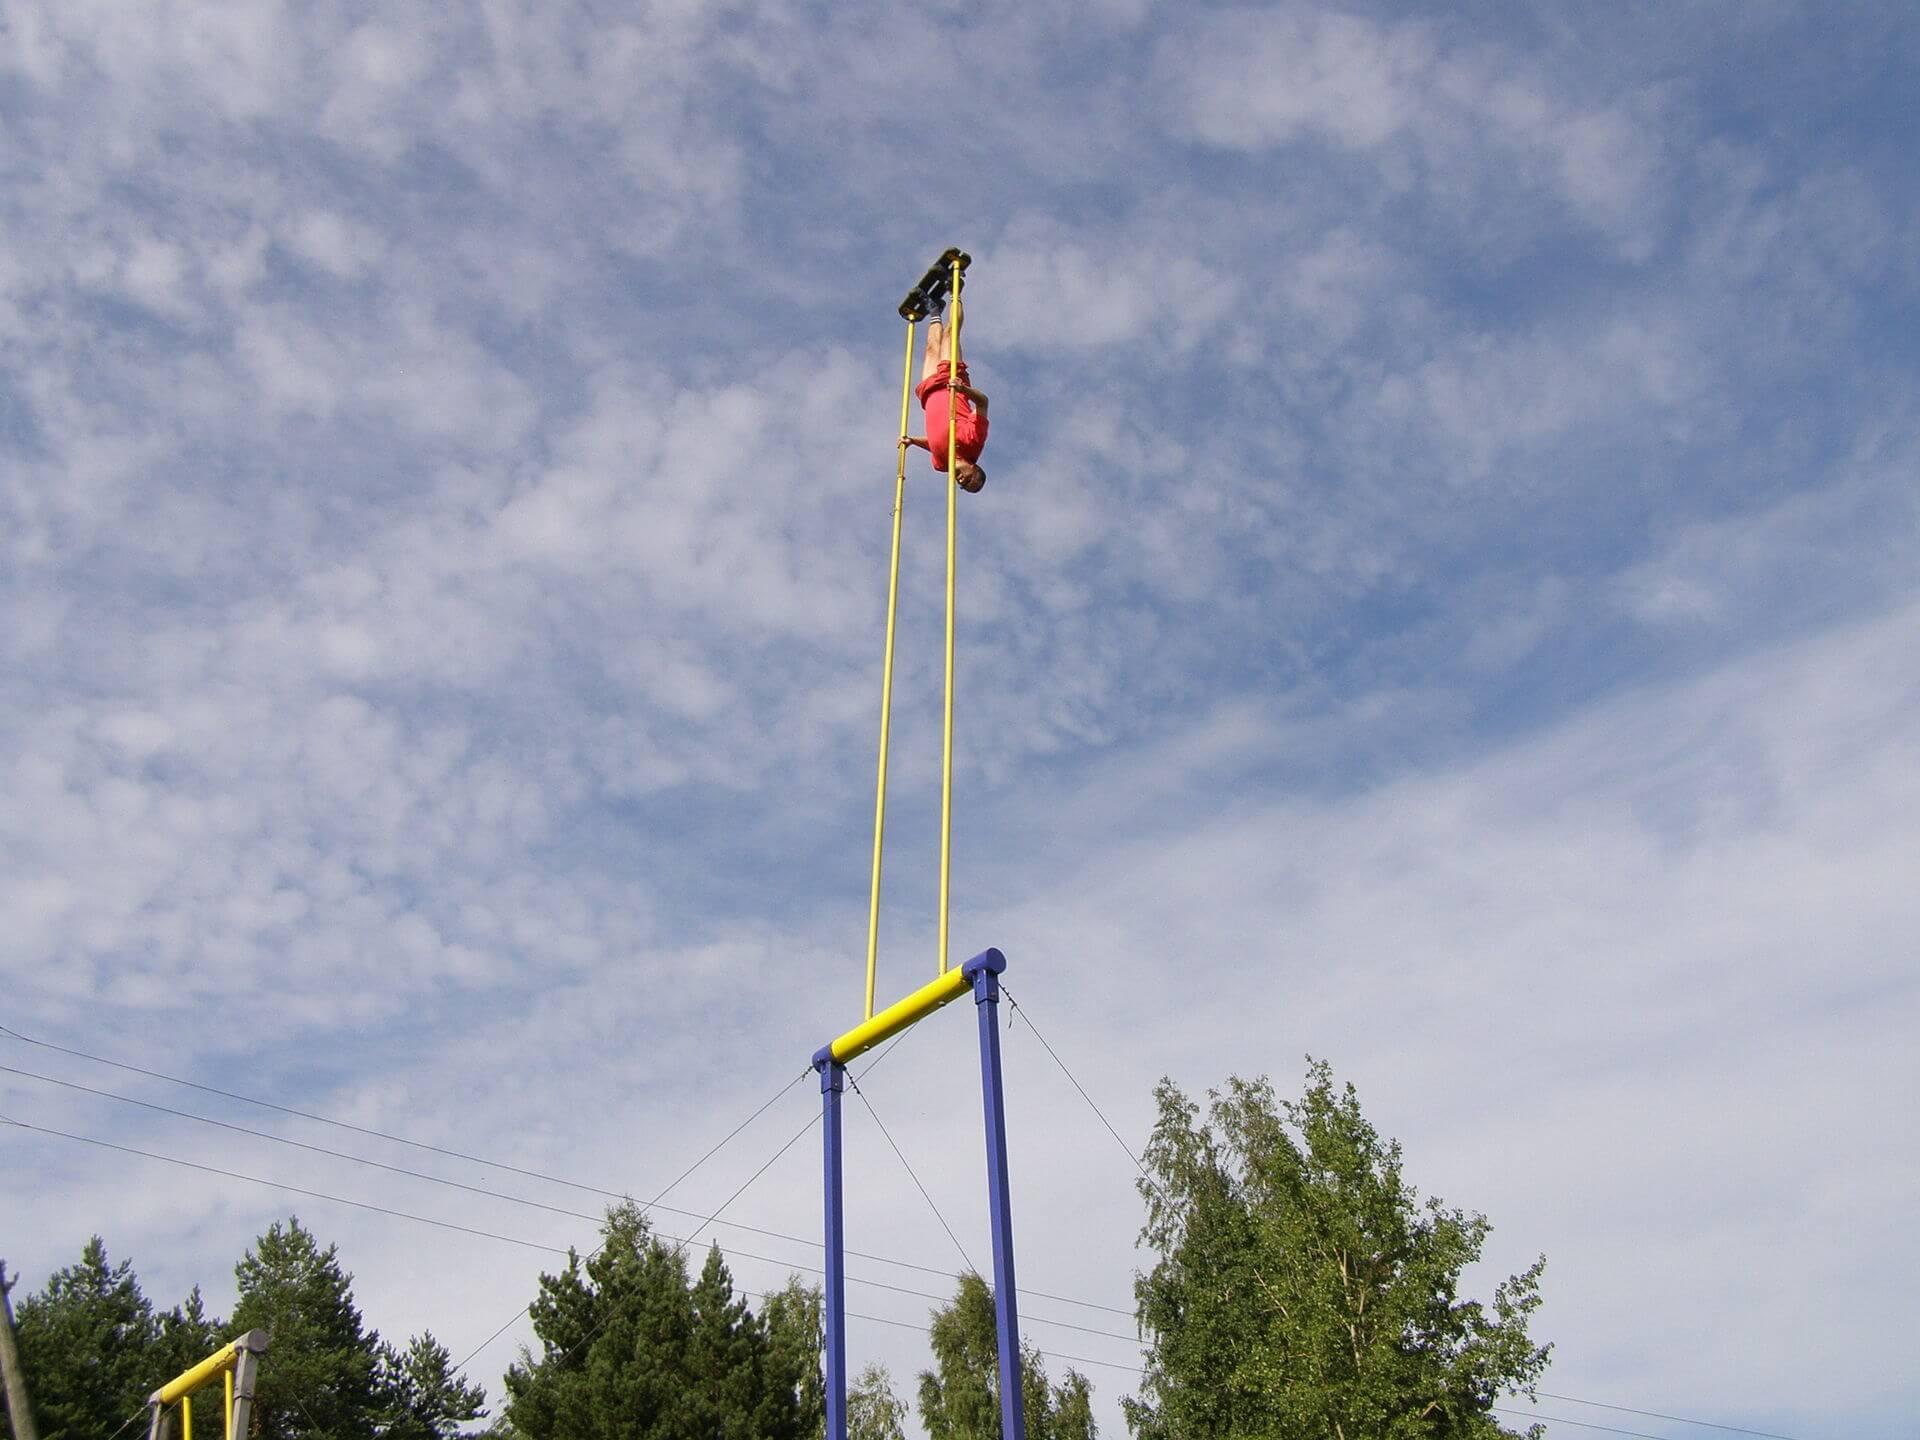 Kiiking balançoire estonienne